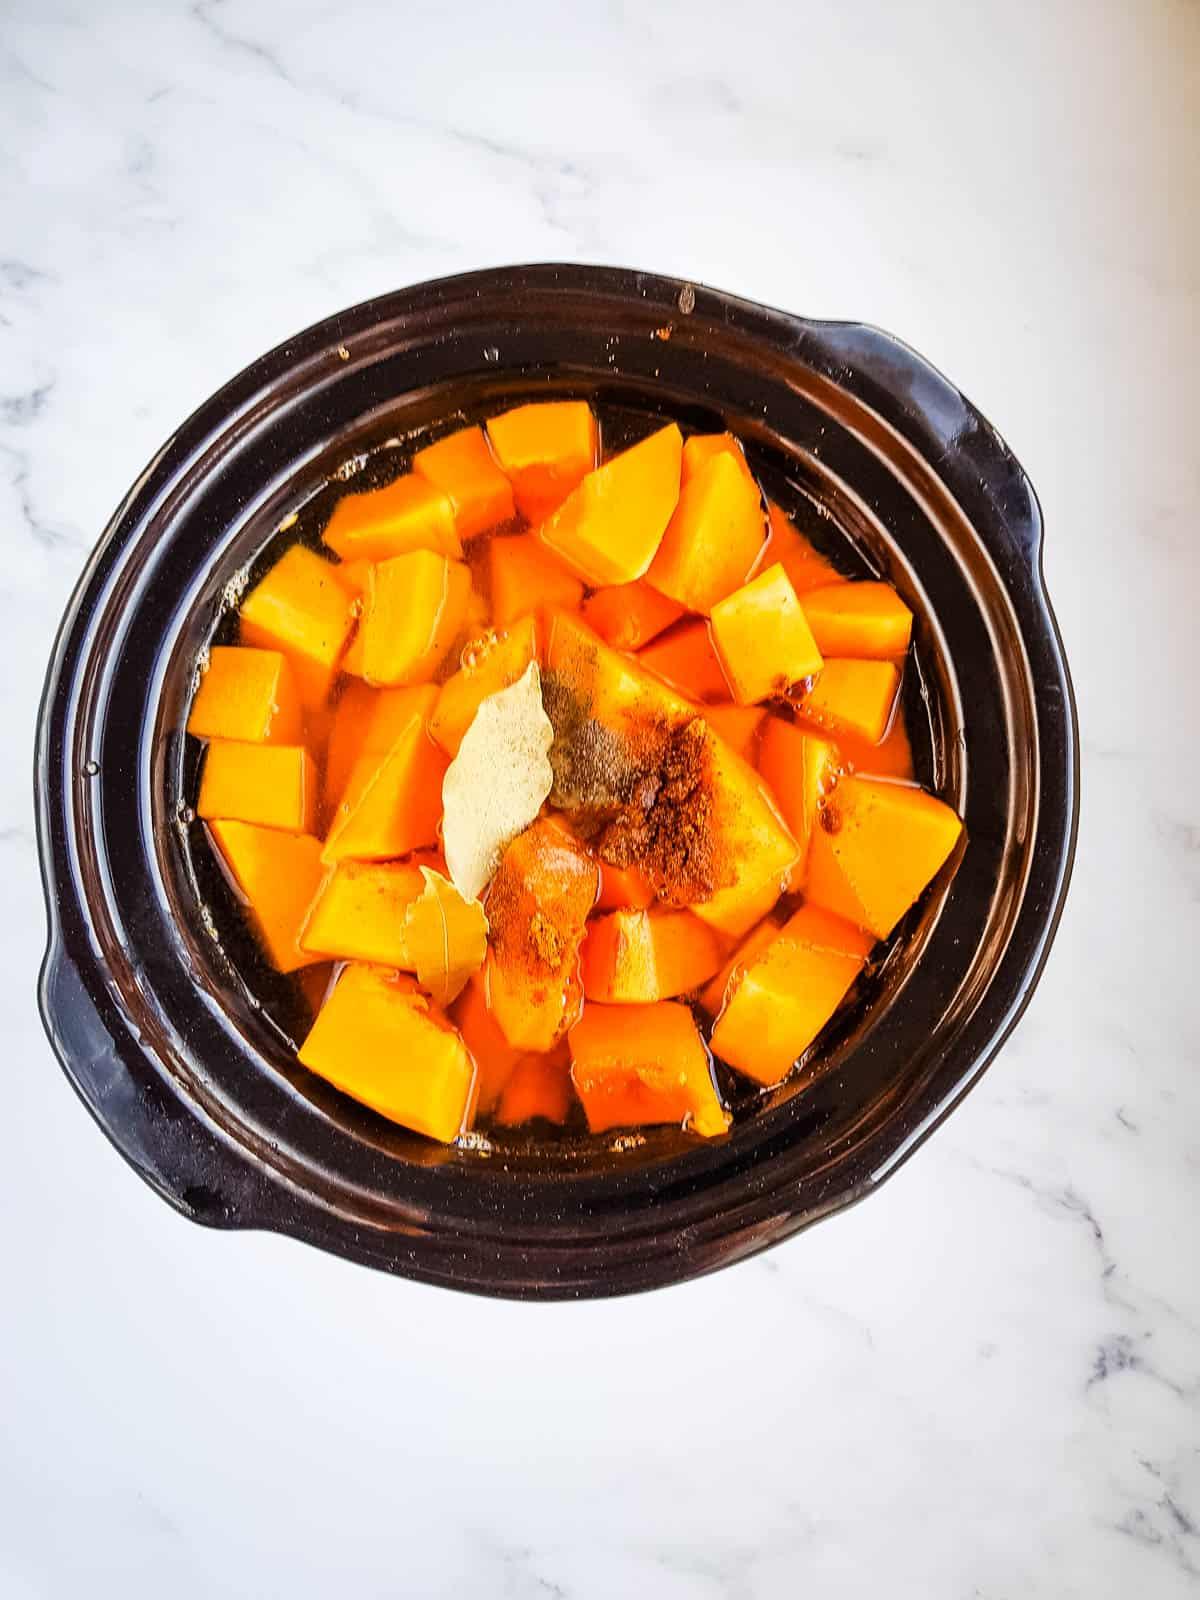 Pumpkin soup ingredients in a slow cooker.